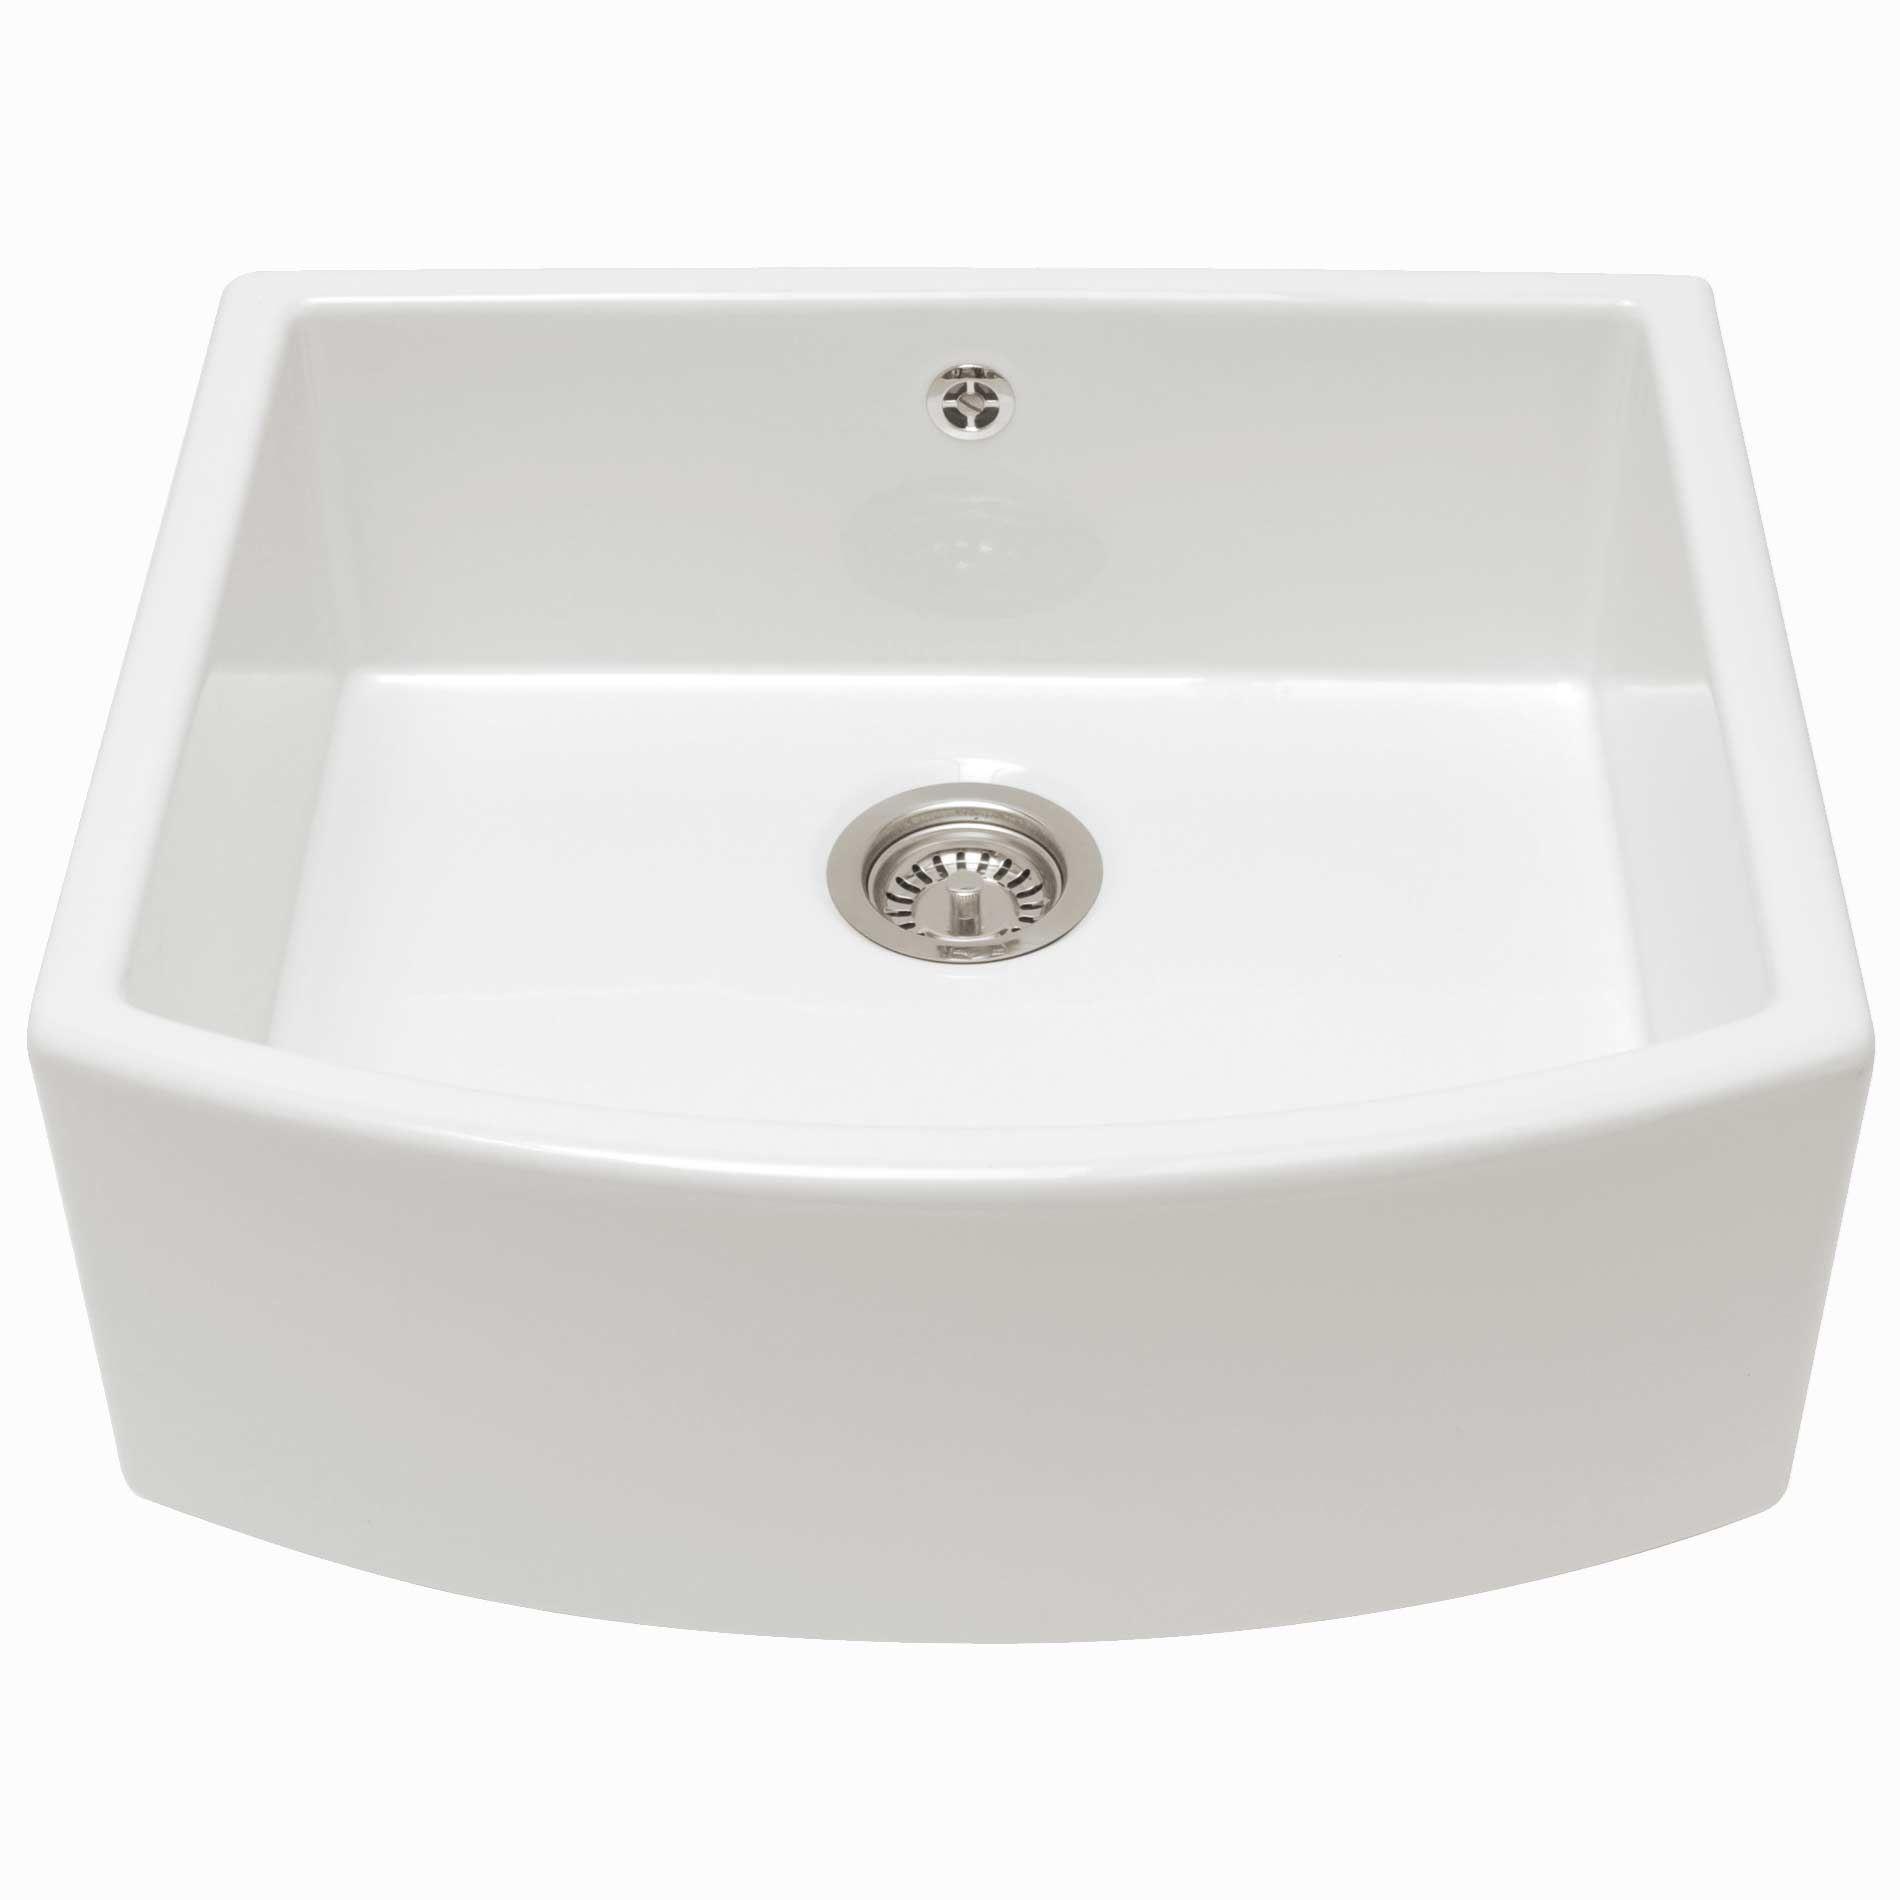 single bowl kitchen sinks nook lighting caple pemberley ceramic sink